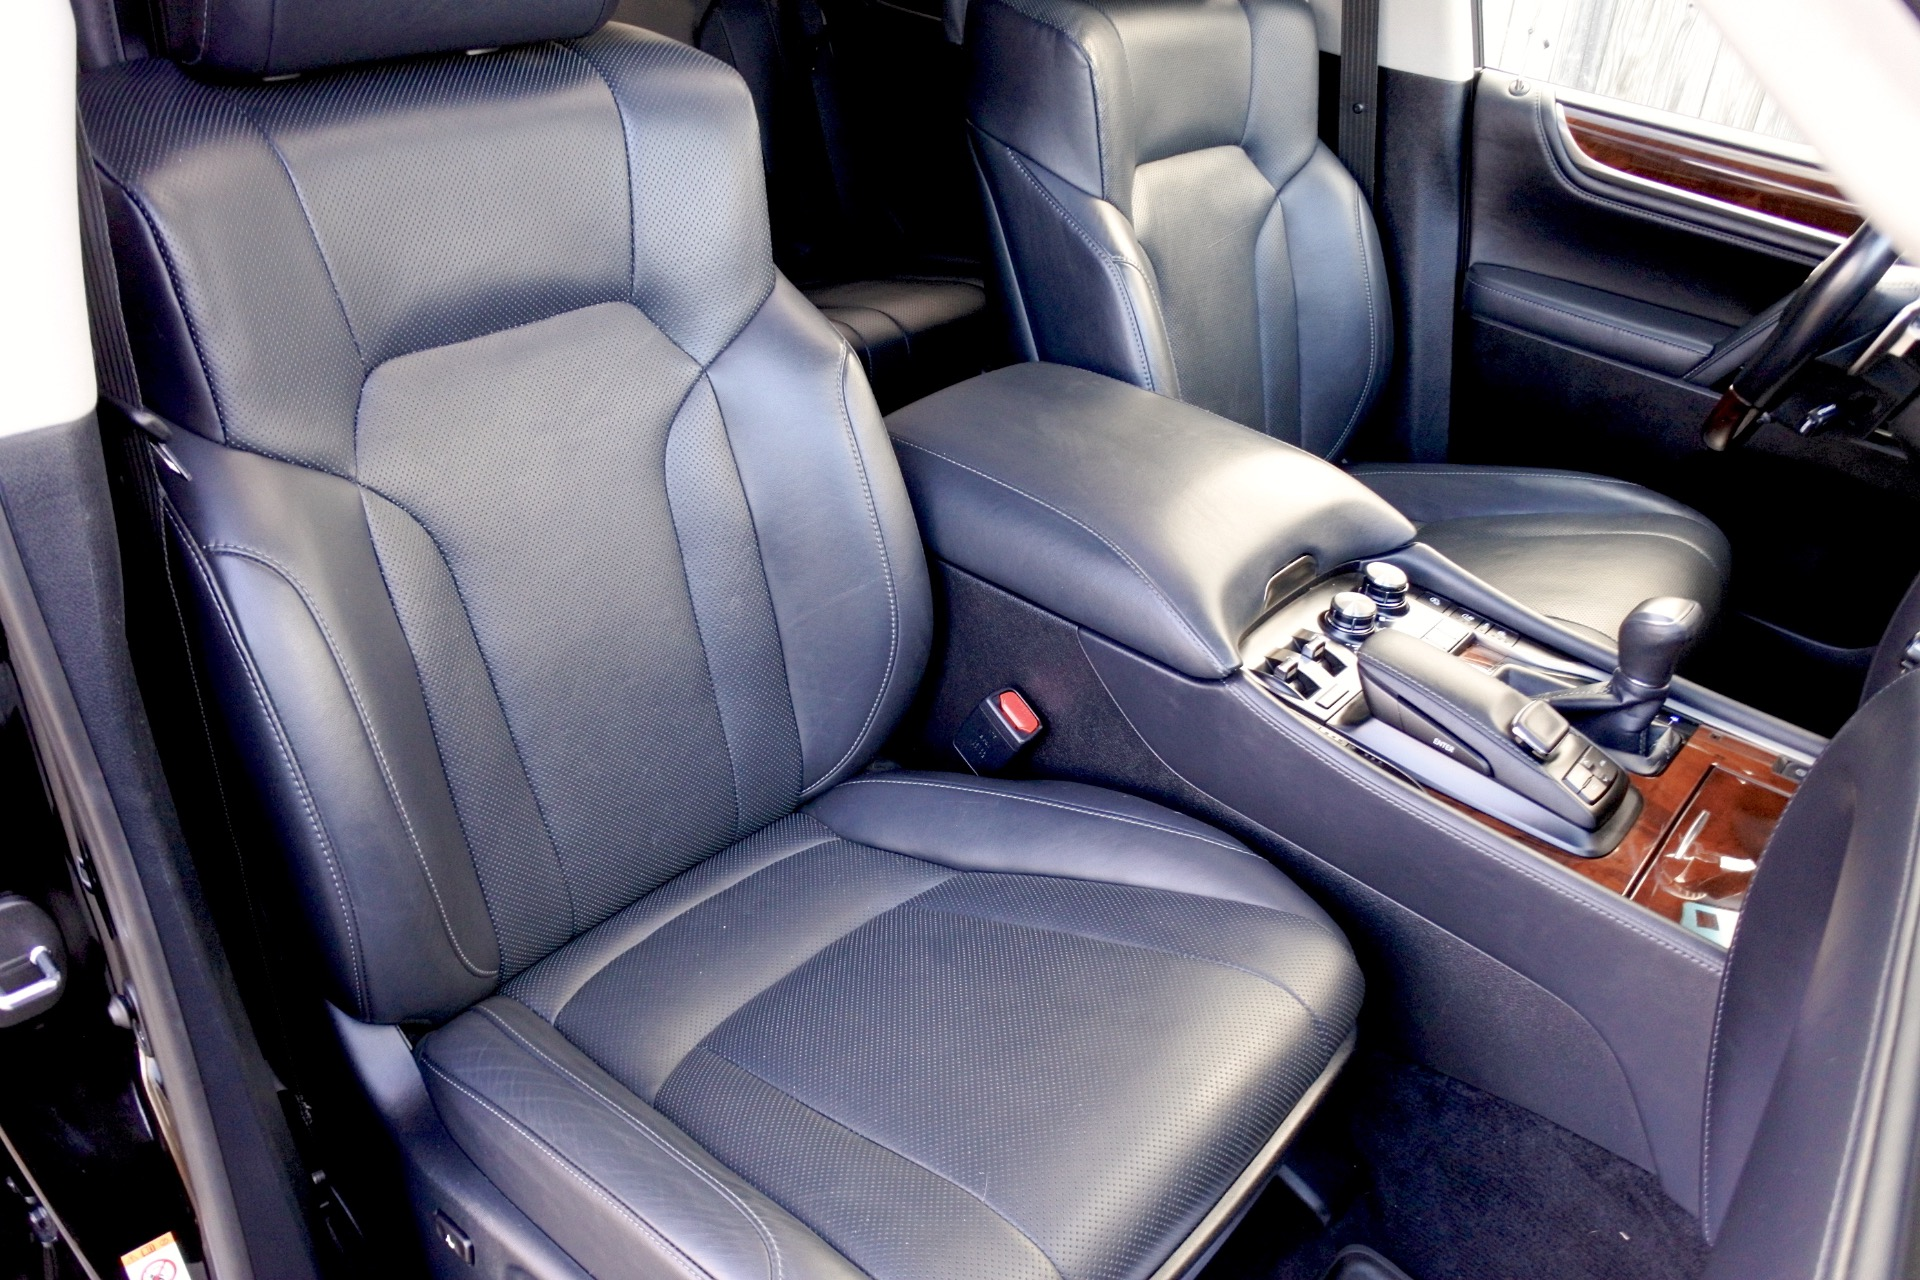 Used 2017 Lexus Lx LX 570 4WD Used 2017 Lexus Lx LX 570 4WD for sale  at Metro West Motorcars LLC in Shrewsbury MA 22